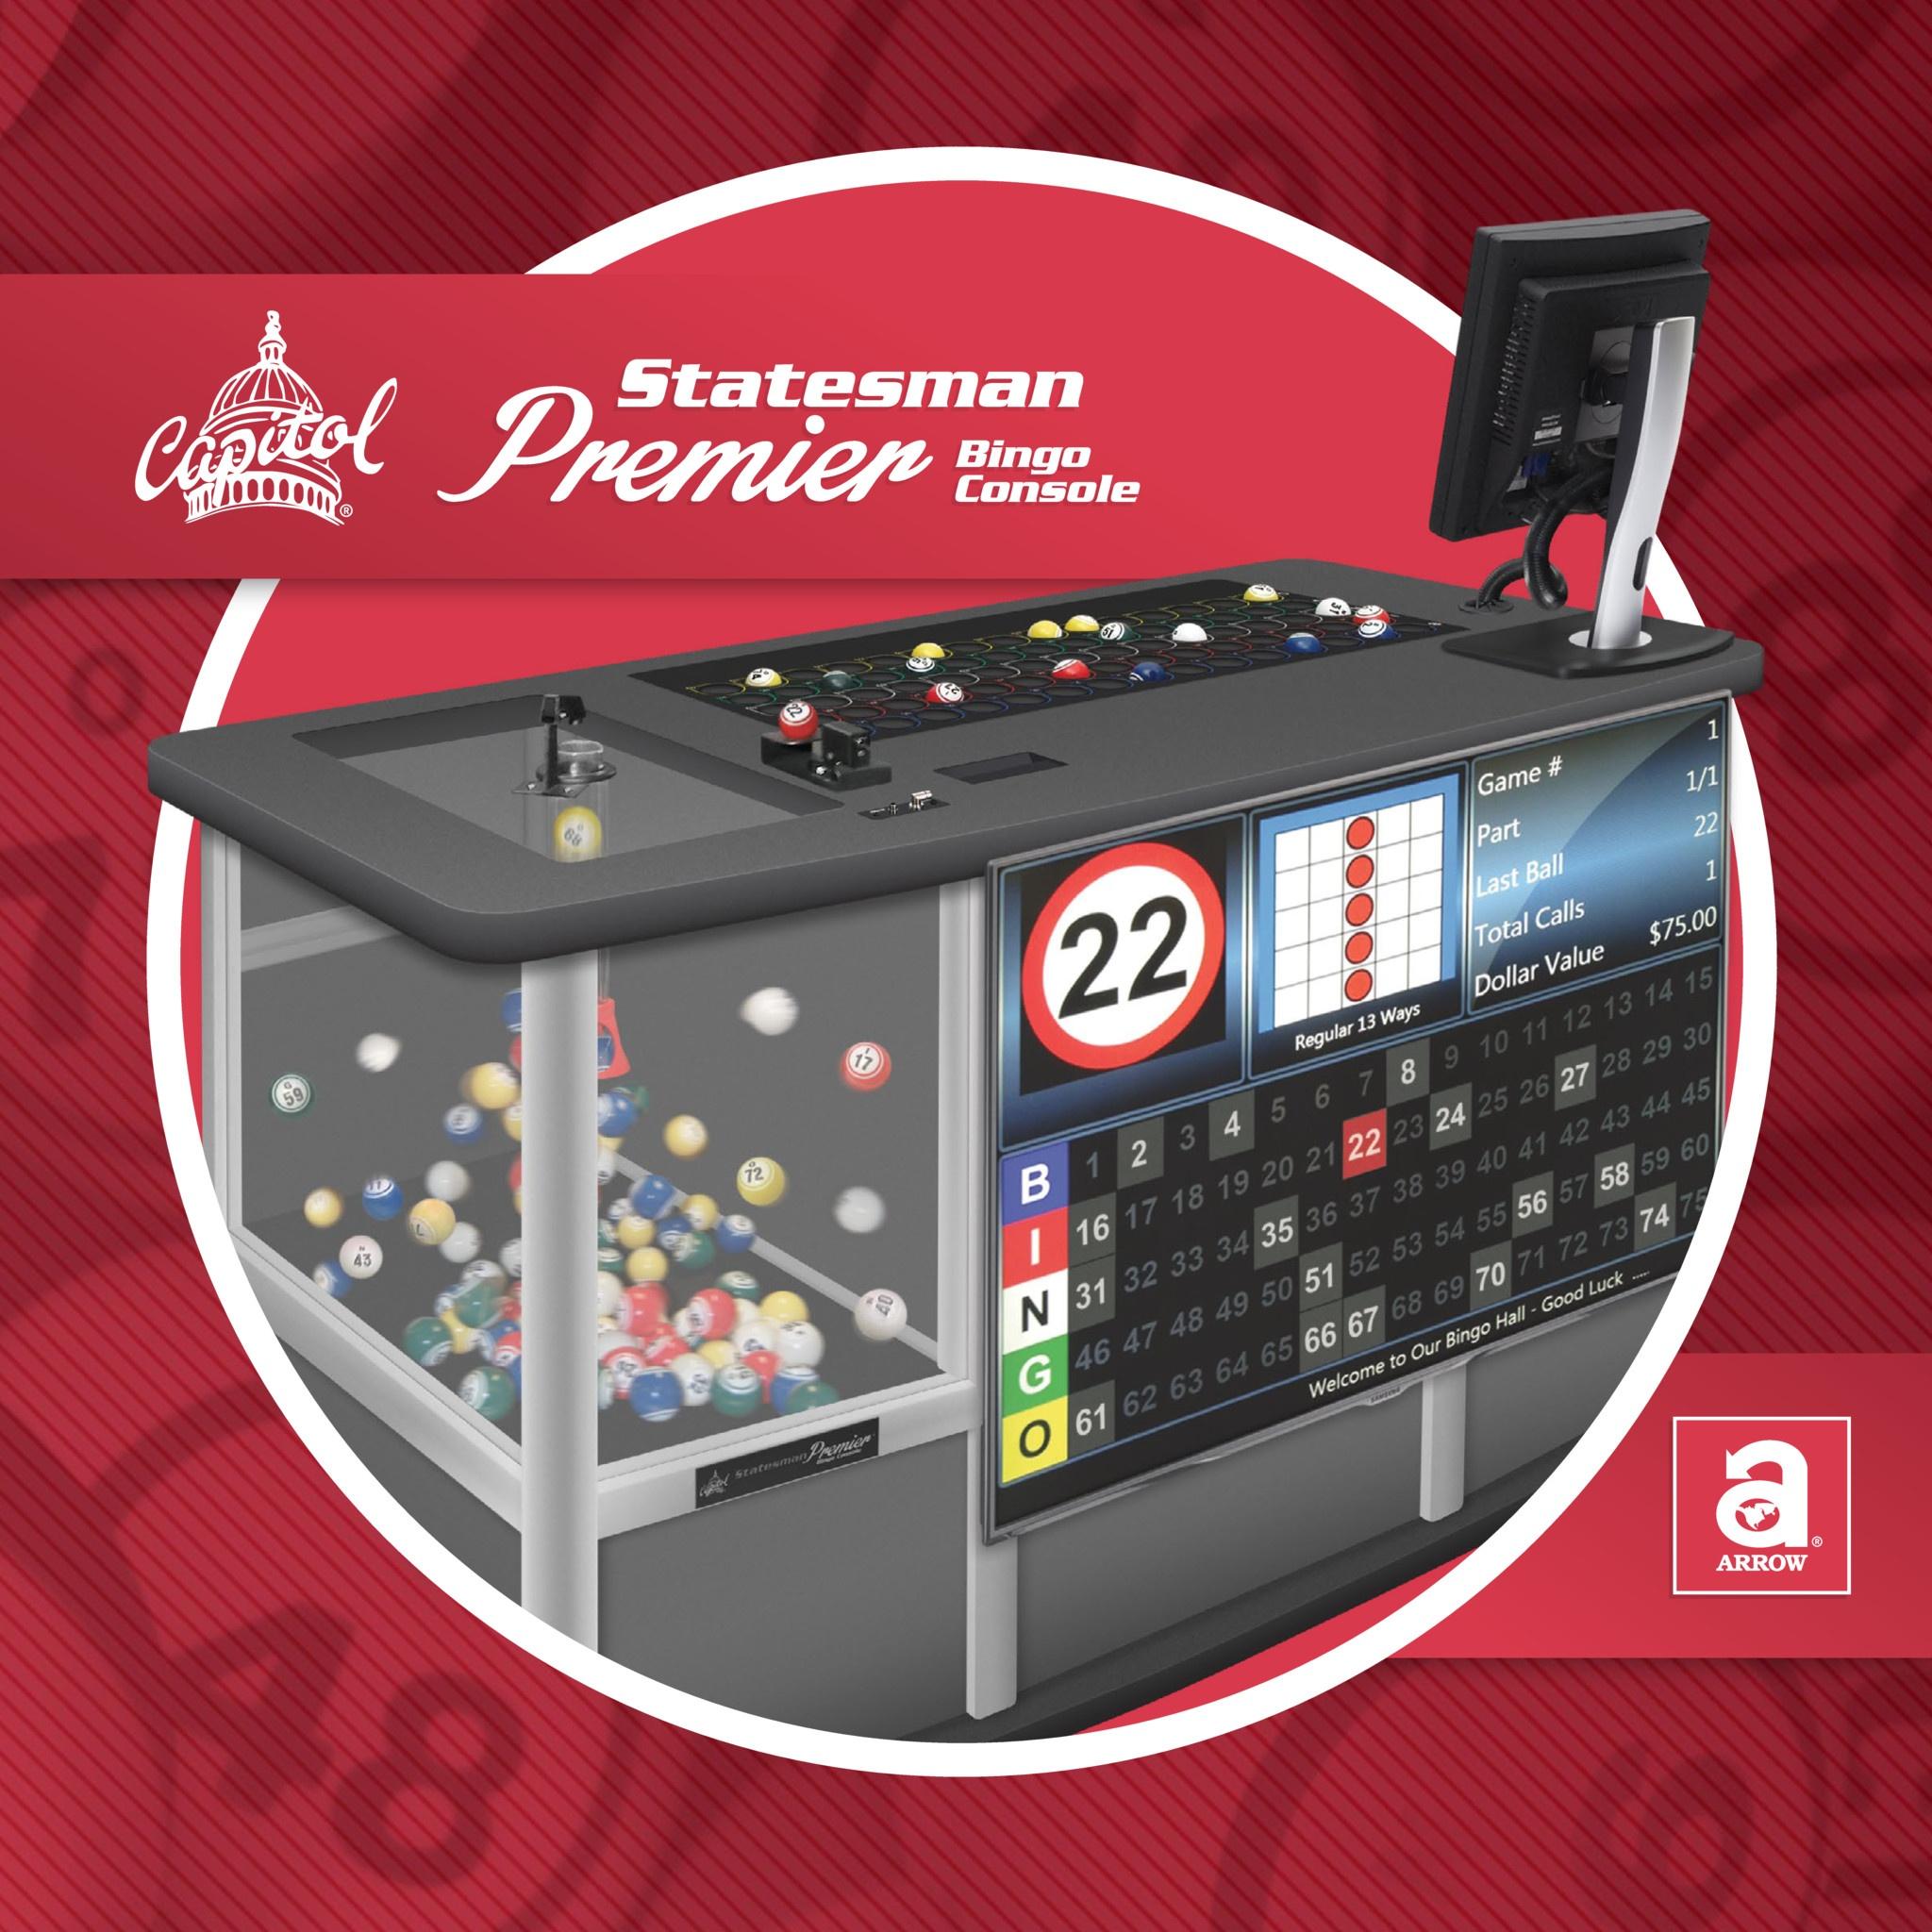 Statesman Premier Brochure Promotional Materials/Equipment Flyers & Brochures